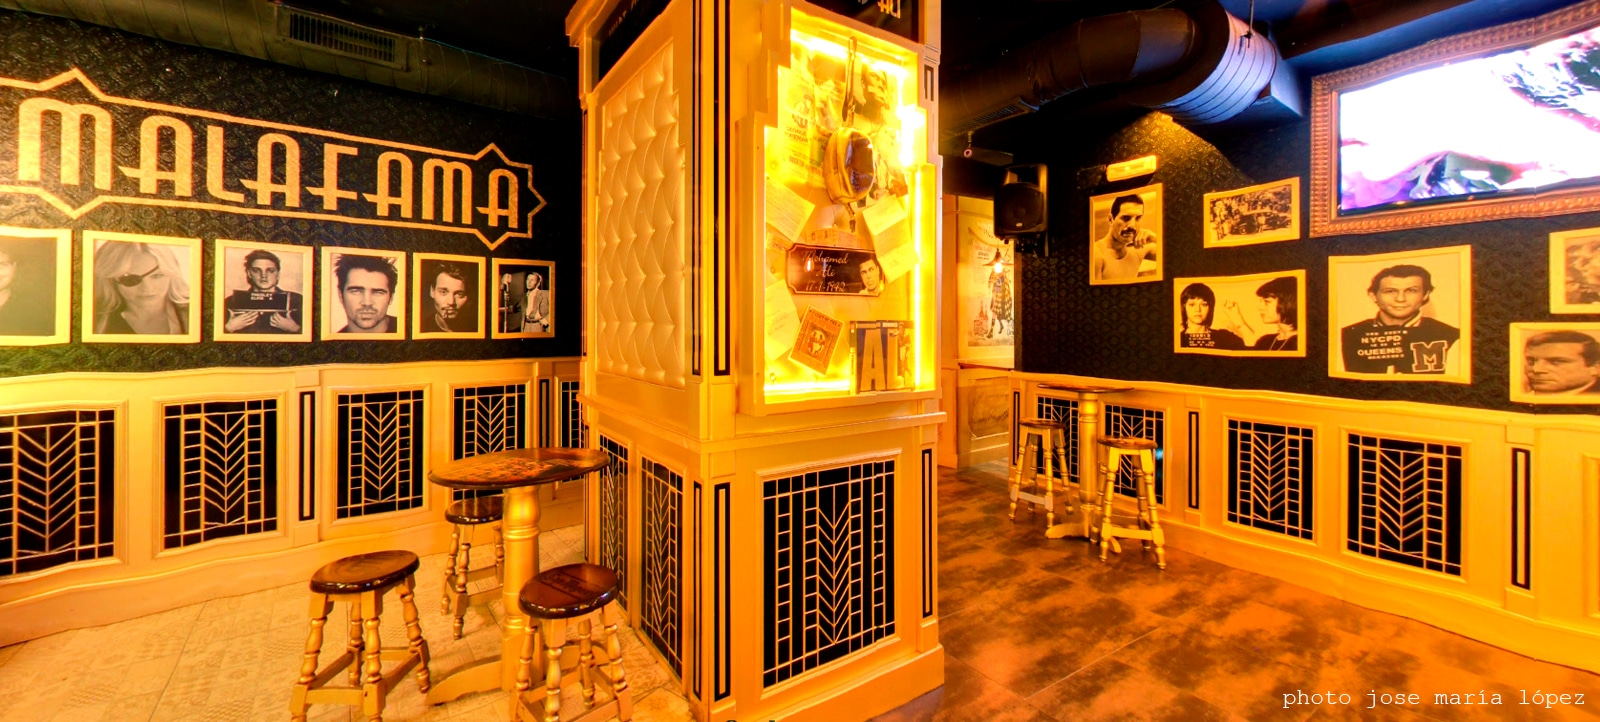 bar malafama Málaga